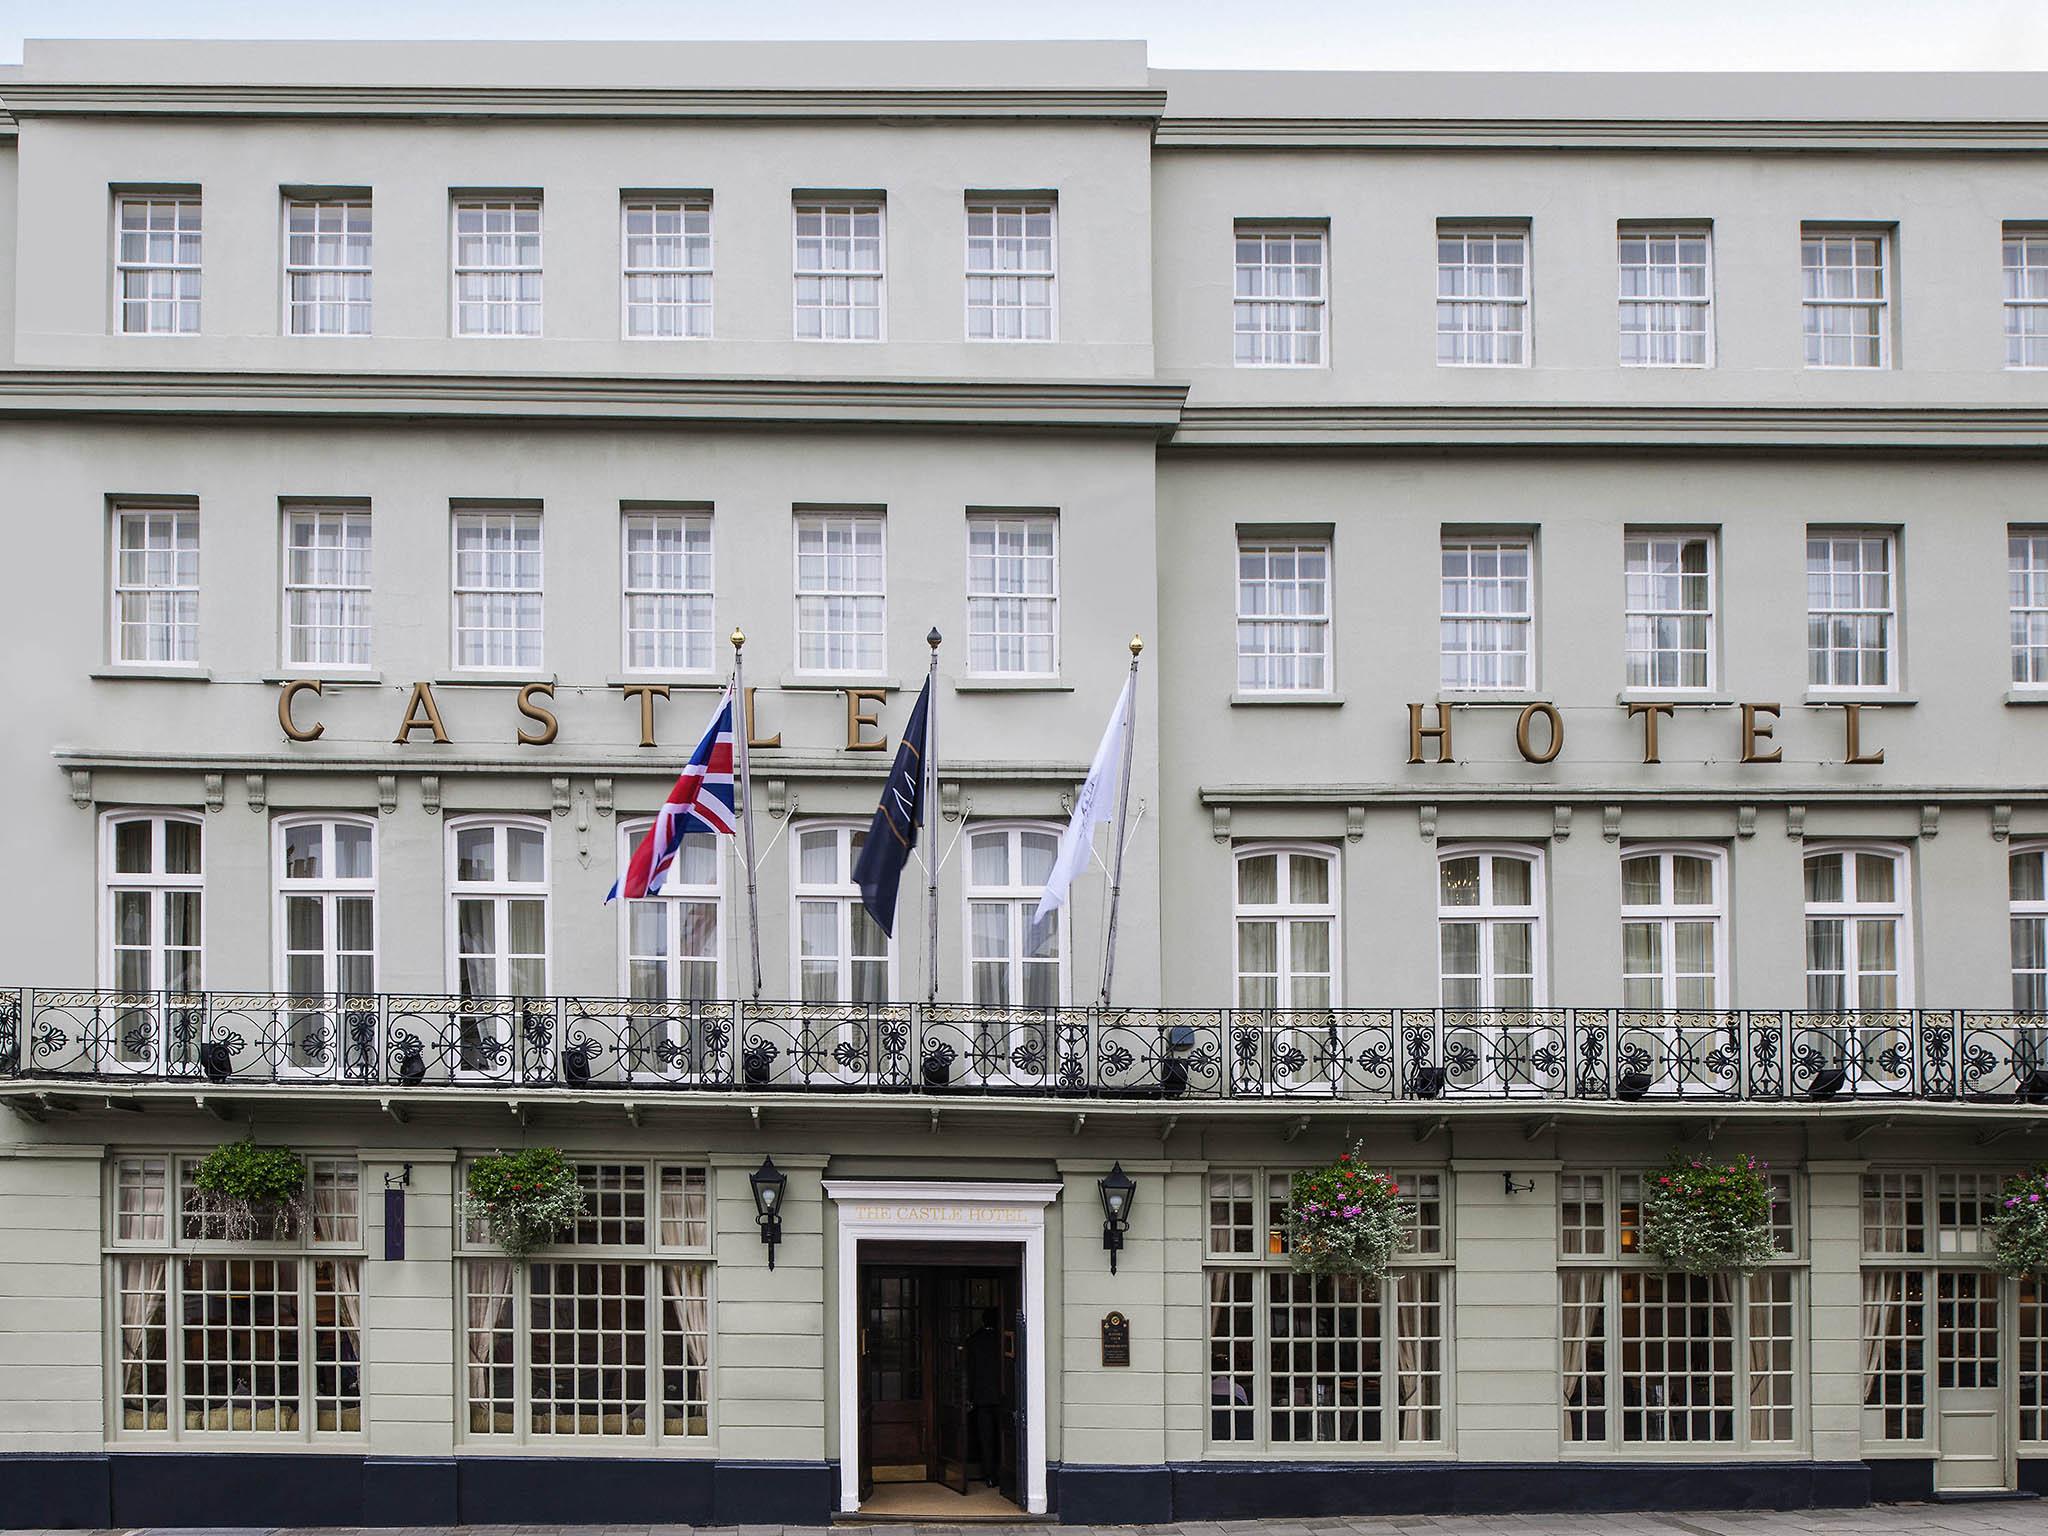 Hôtel - Castle Hotel Windsor - MGallery by Sofitel